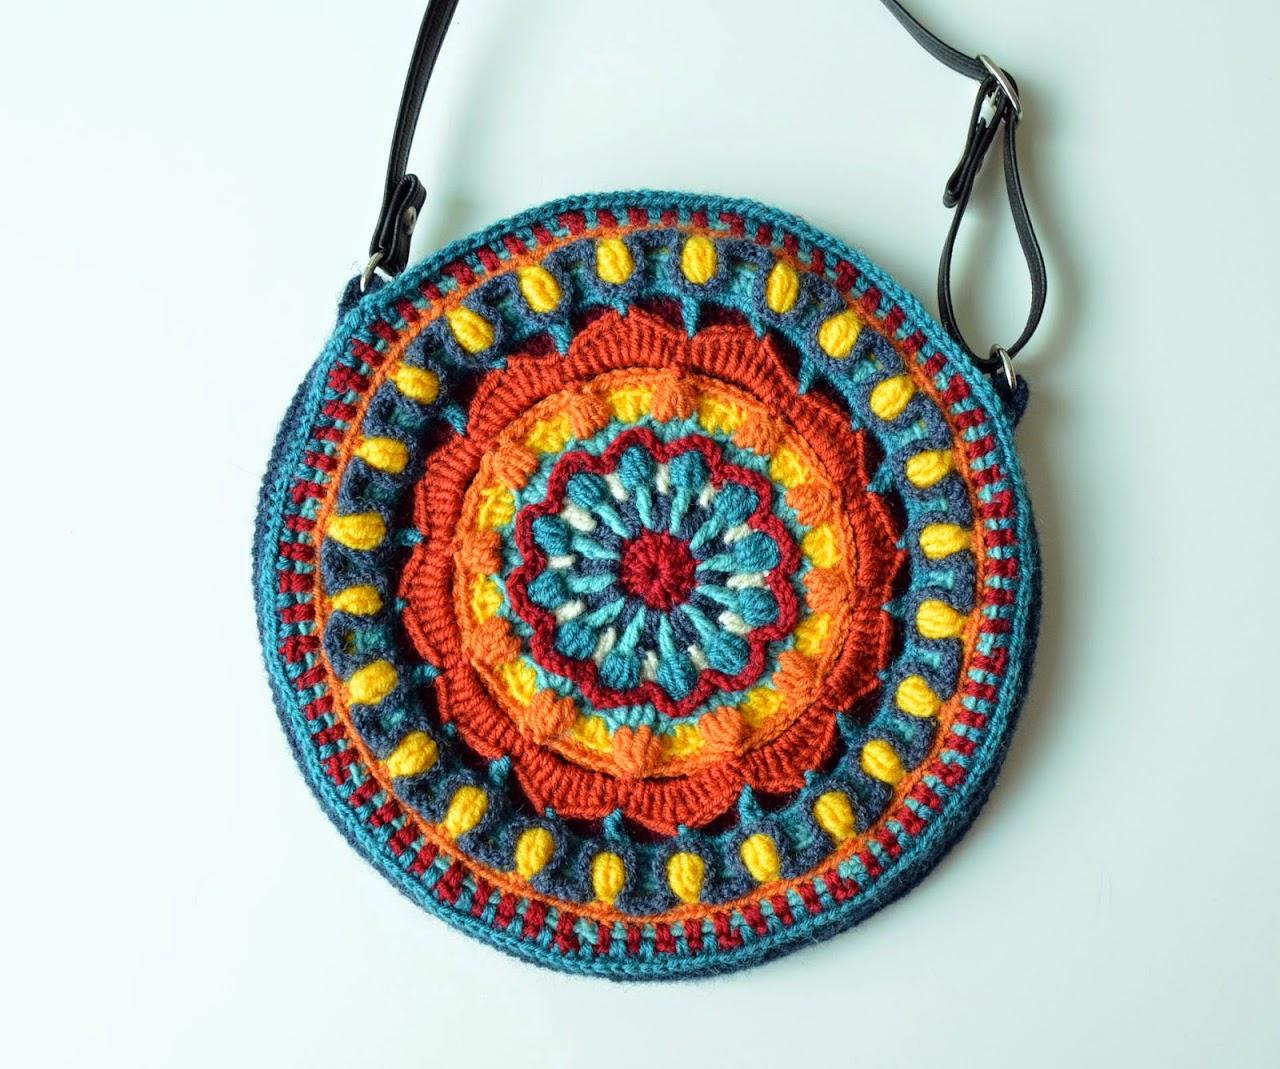 Round crocheted bag